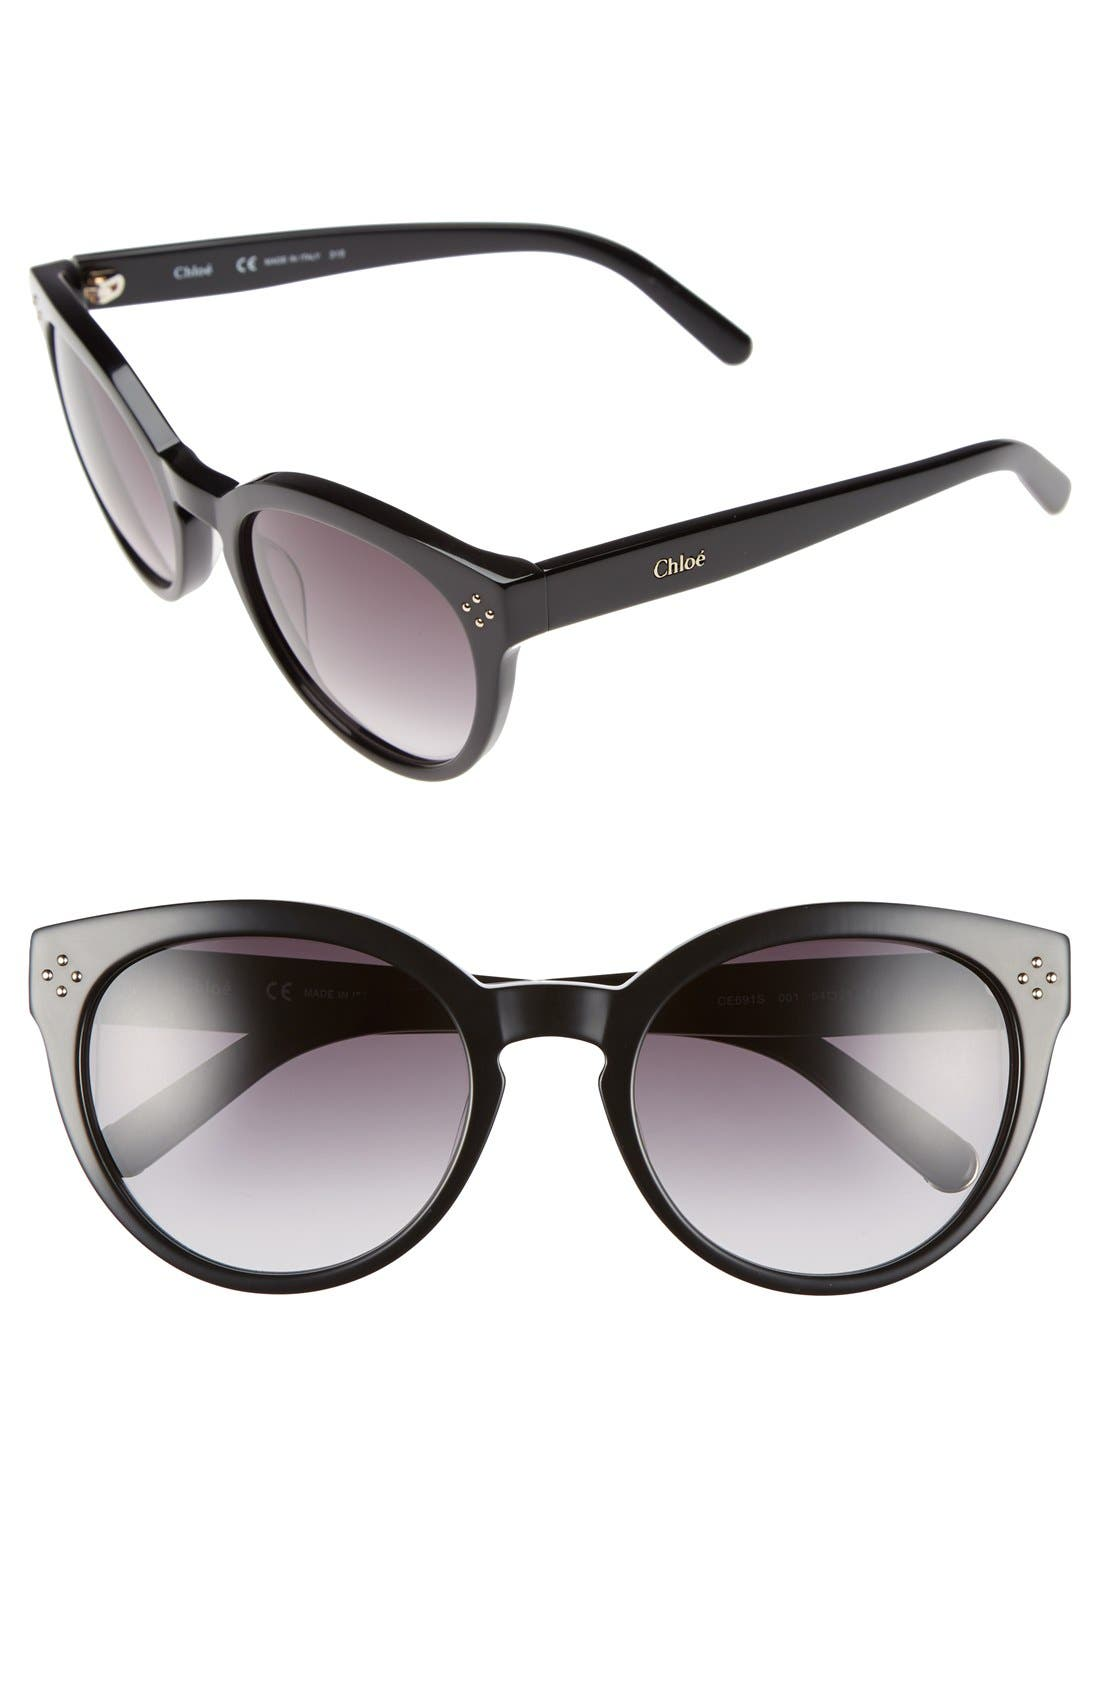 Alternate Image 1 Selected - Chloé 'Boxwood' 54mm Round Sunglasses